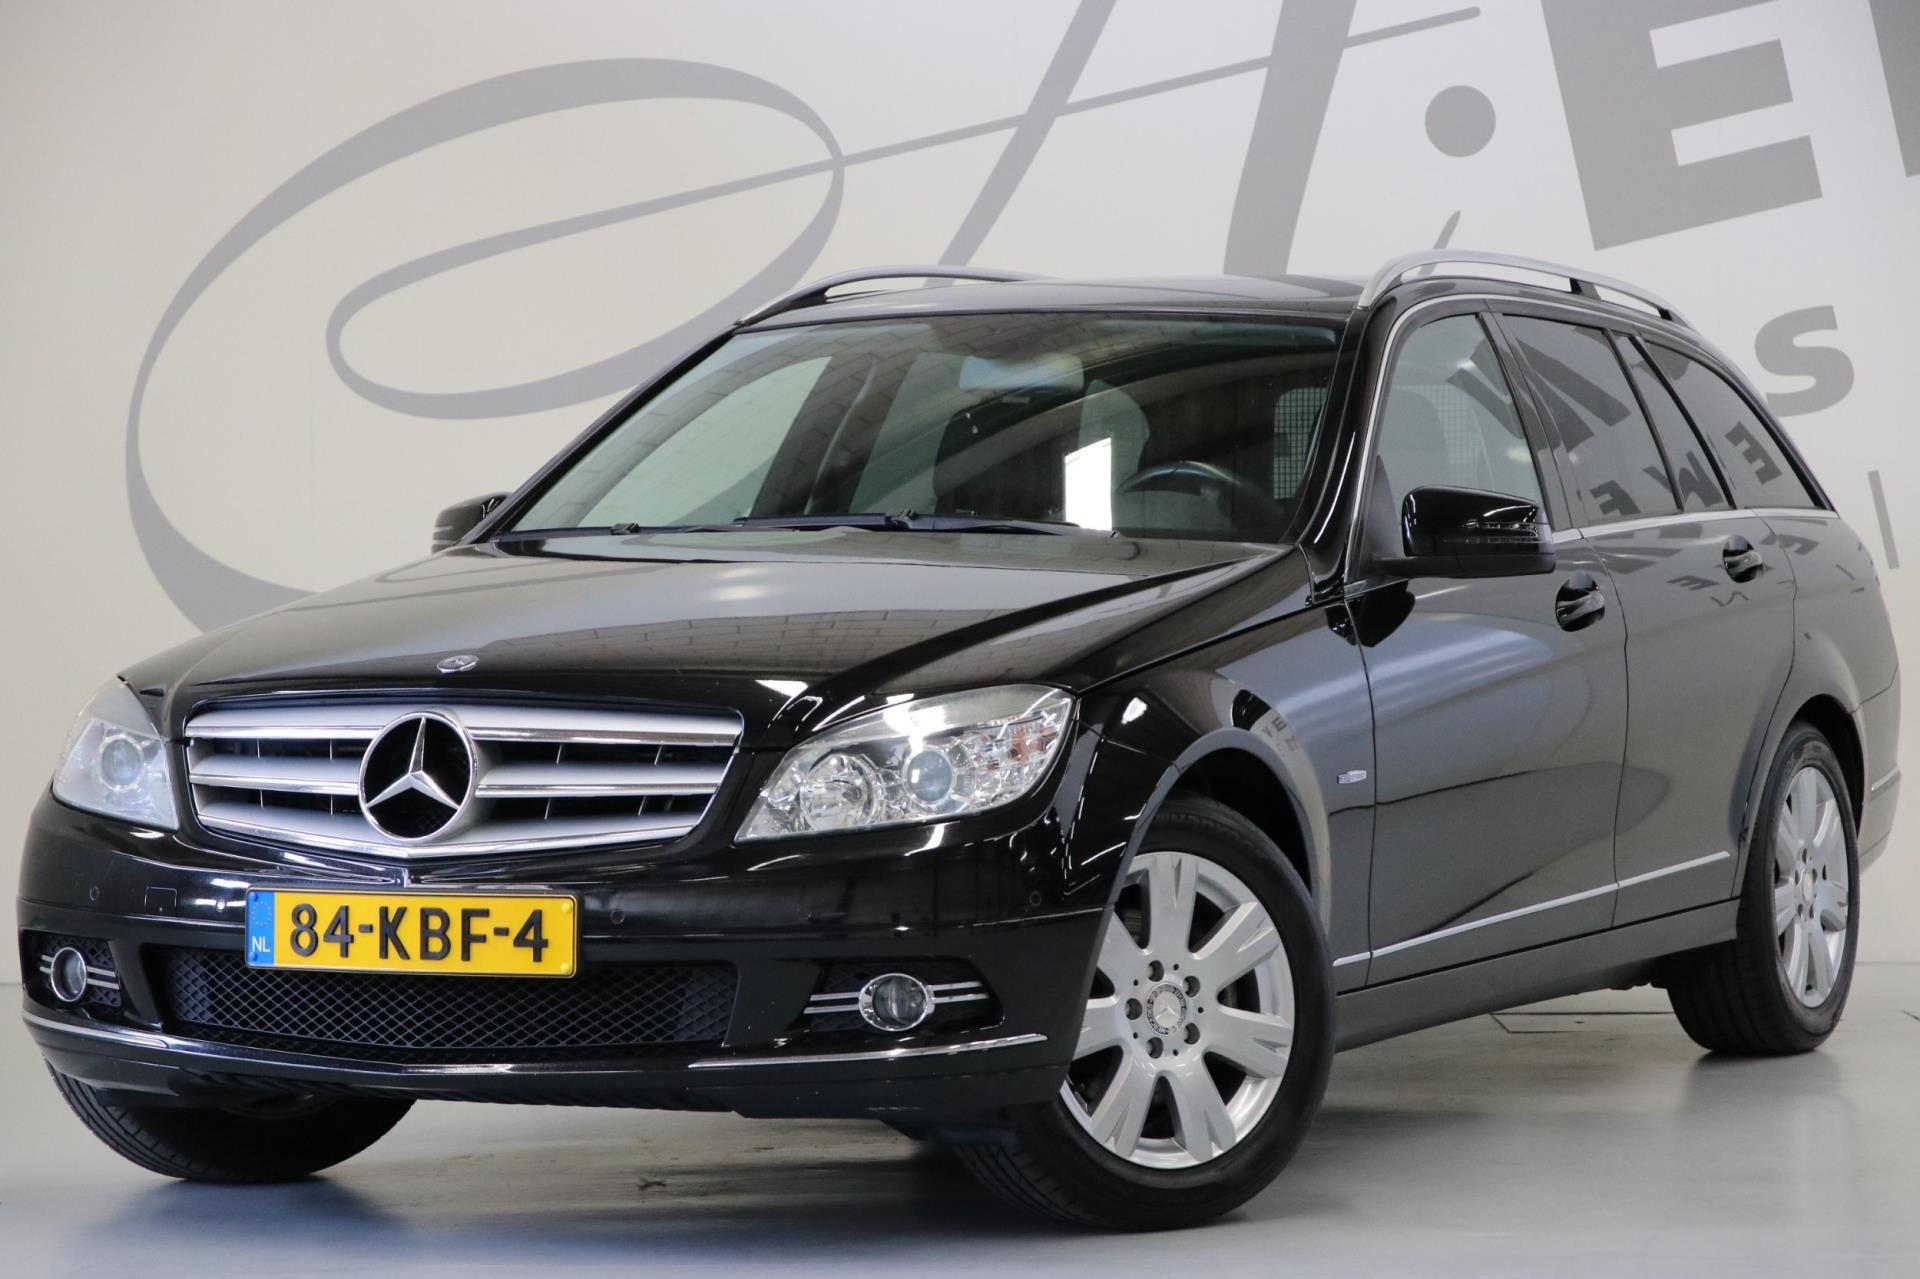 Mercedes-Benz C-klasse Estate occasion - Aeen Exclusieve Automobielen